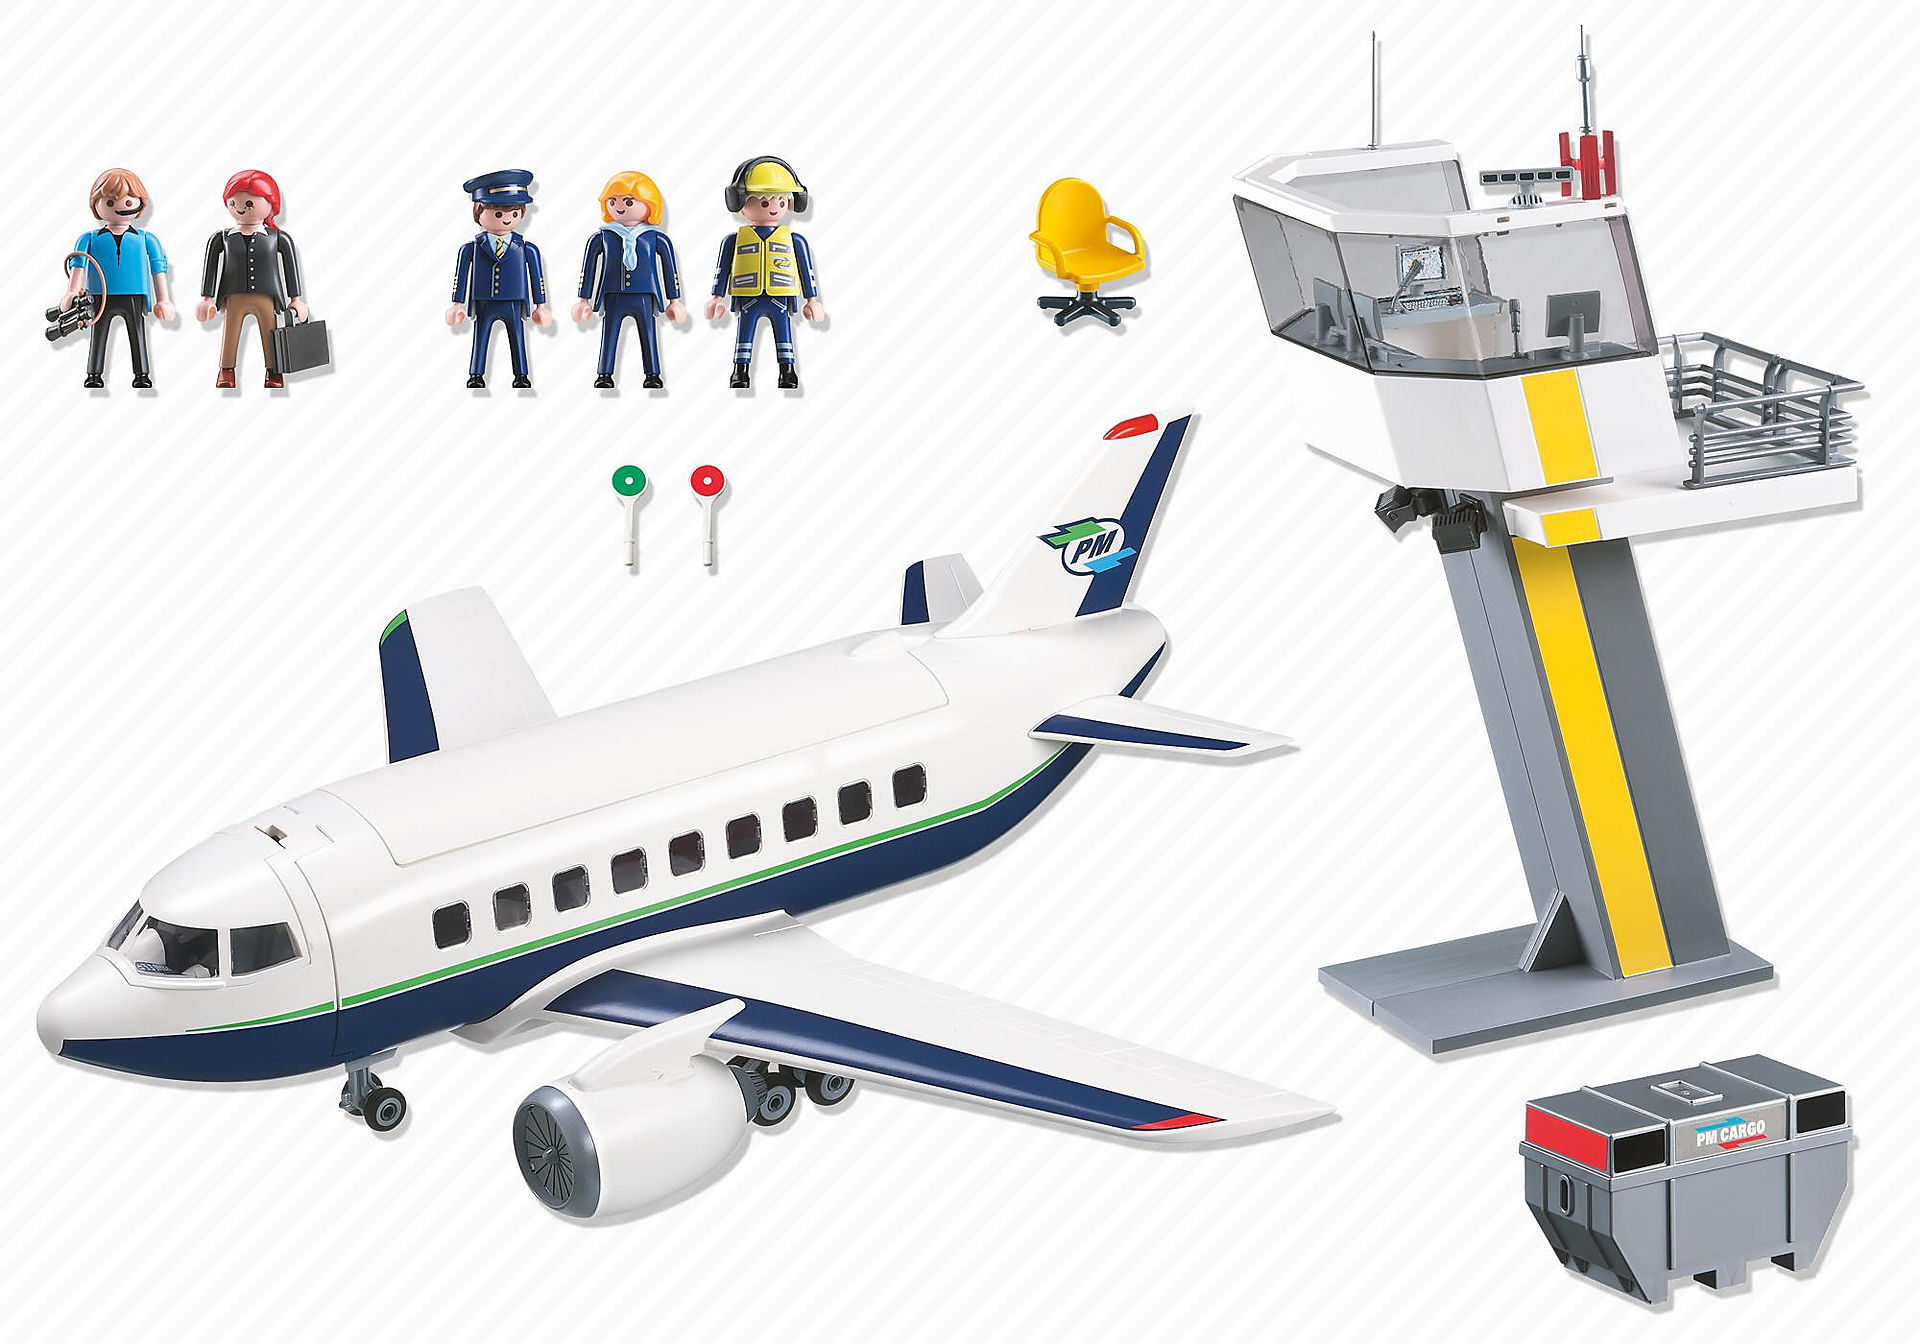 5261 Cargo- und Passagierflugzeug zoom image4